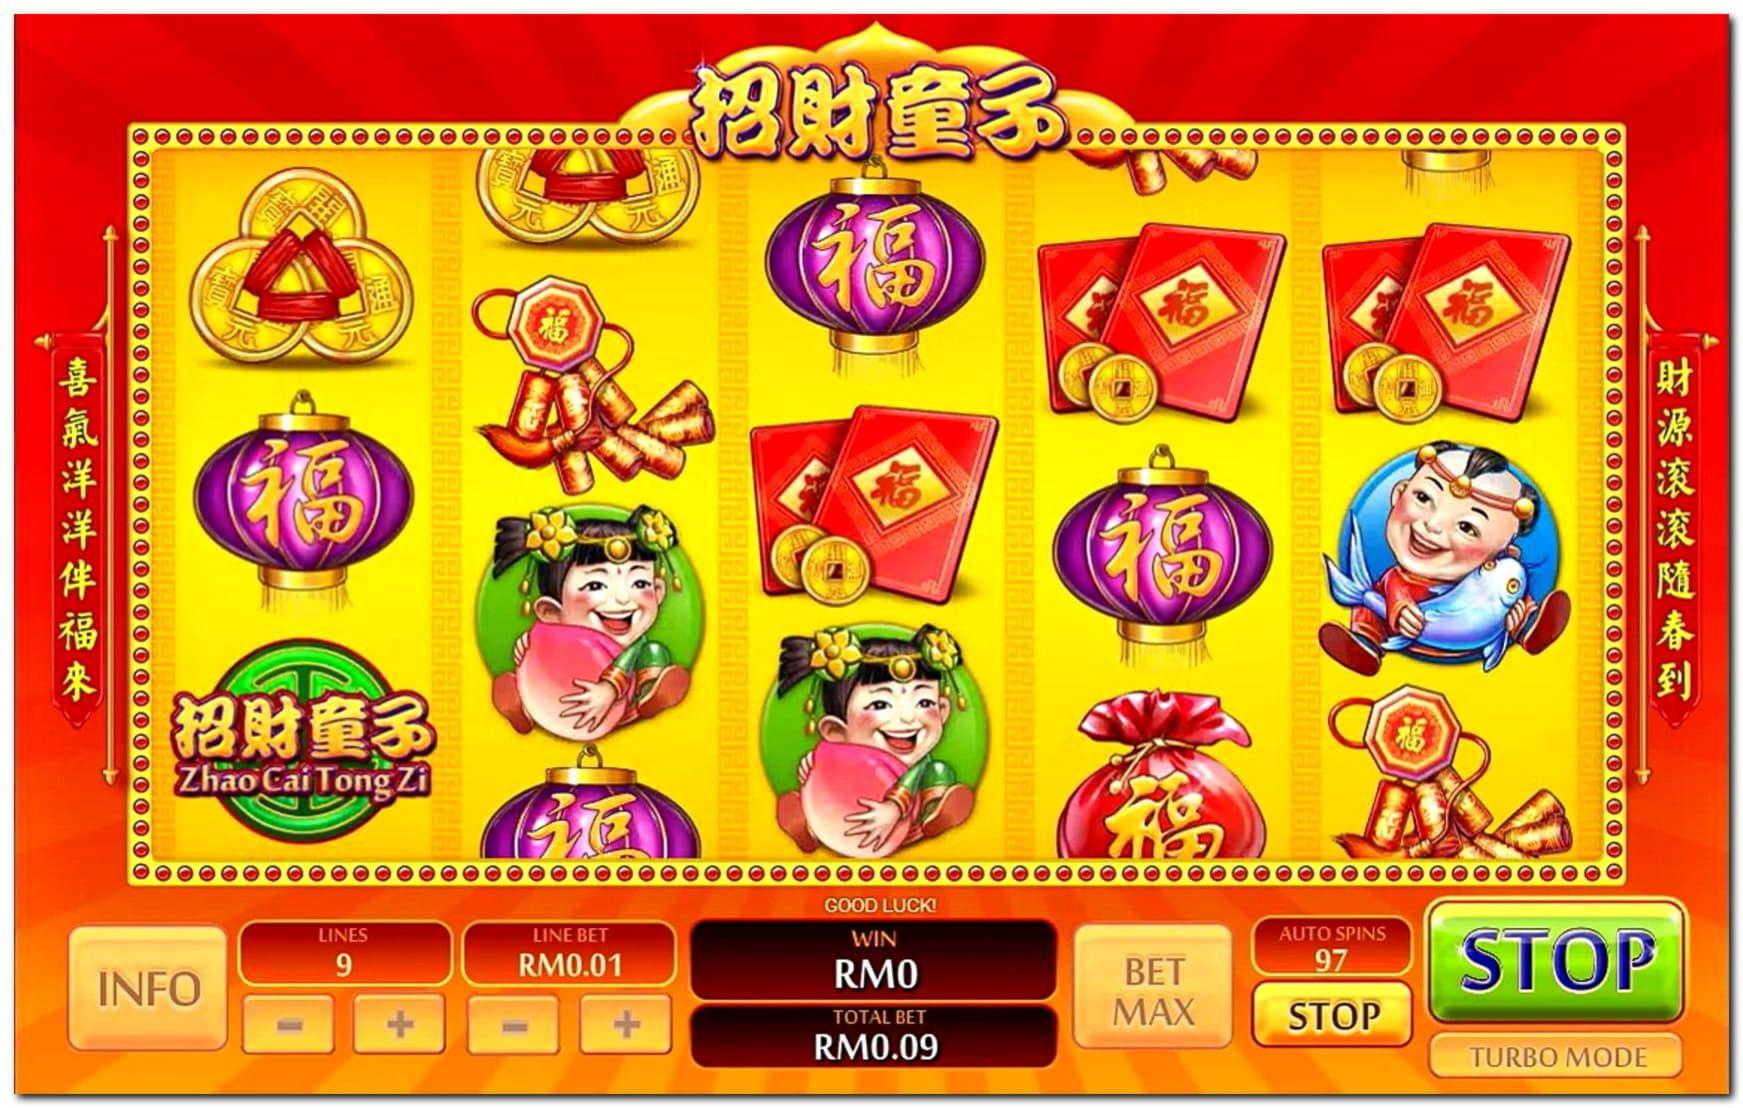 free chip casino online